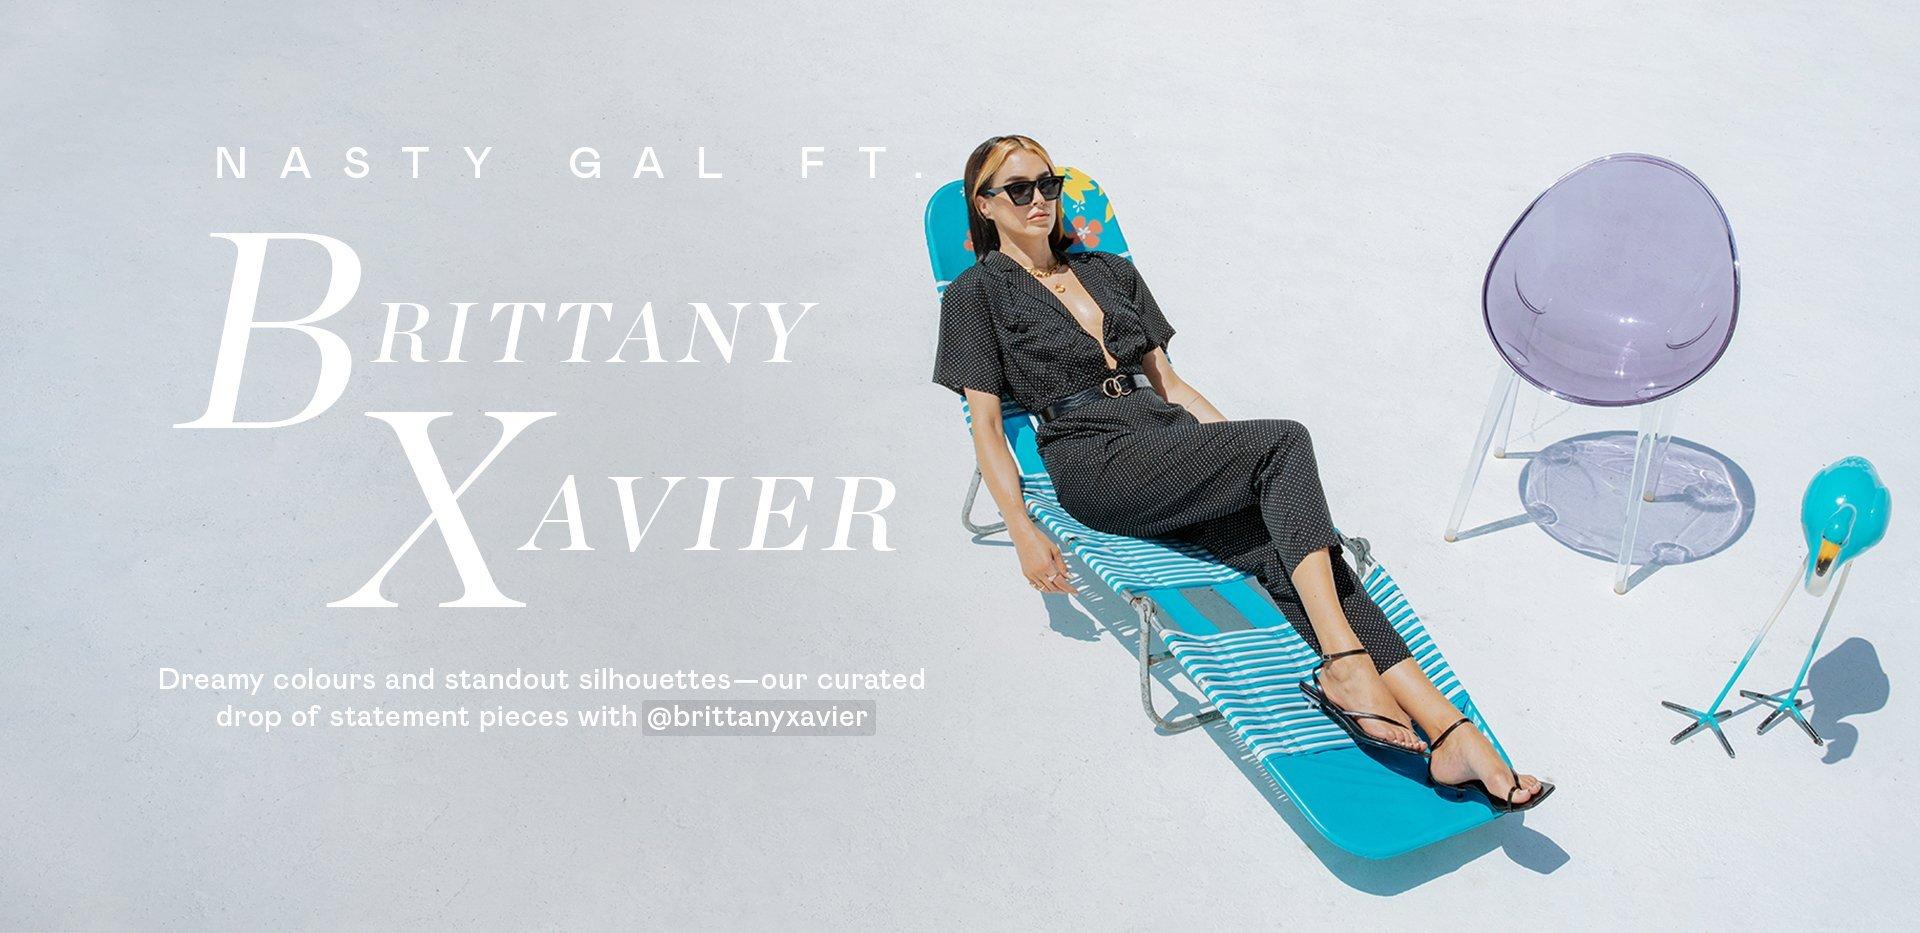 Brittany Xavier ft. Nasty Gal